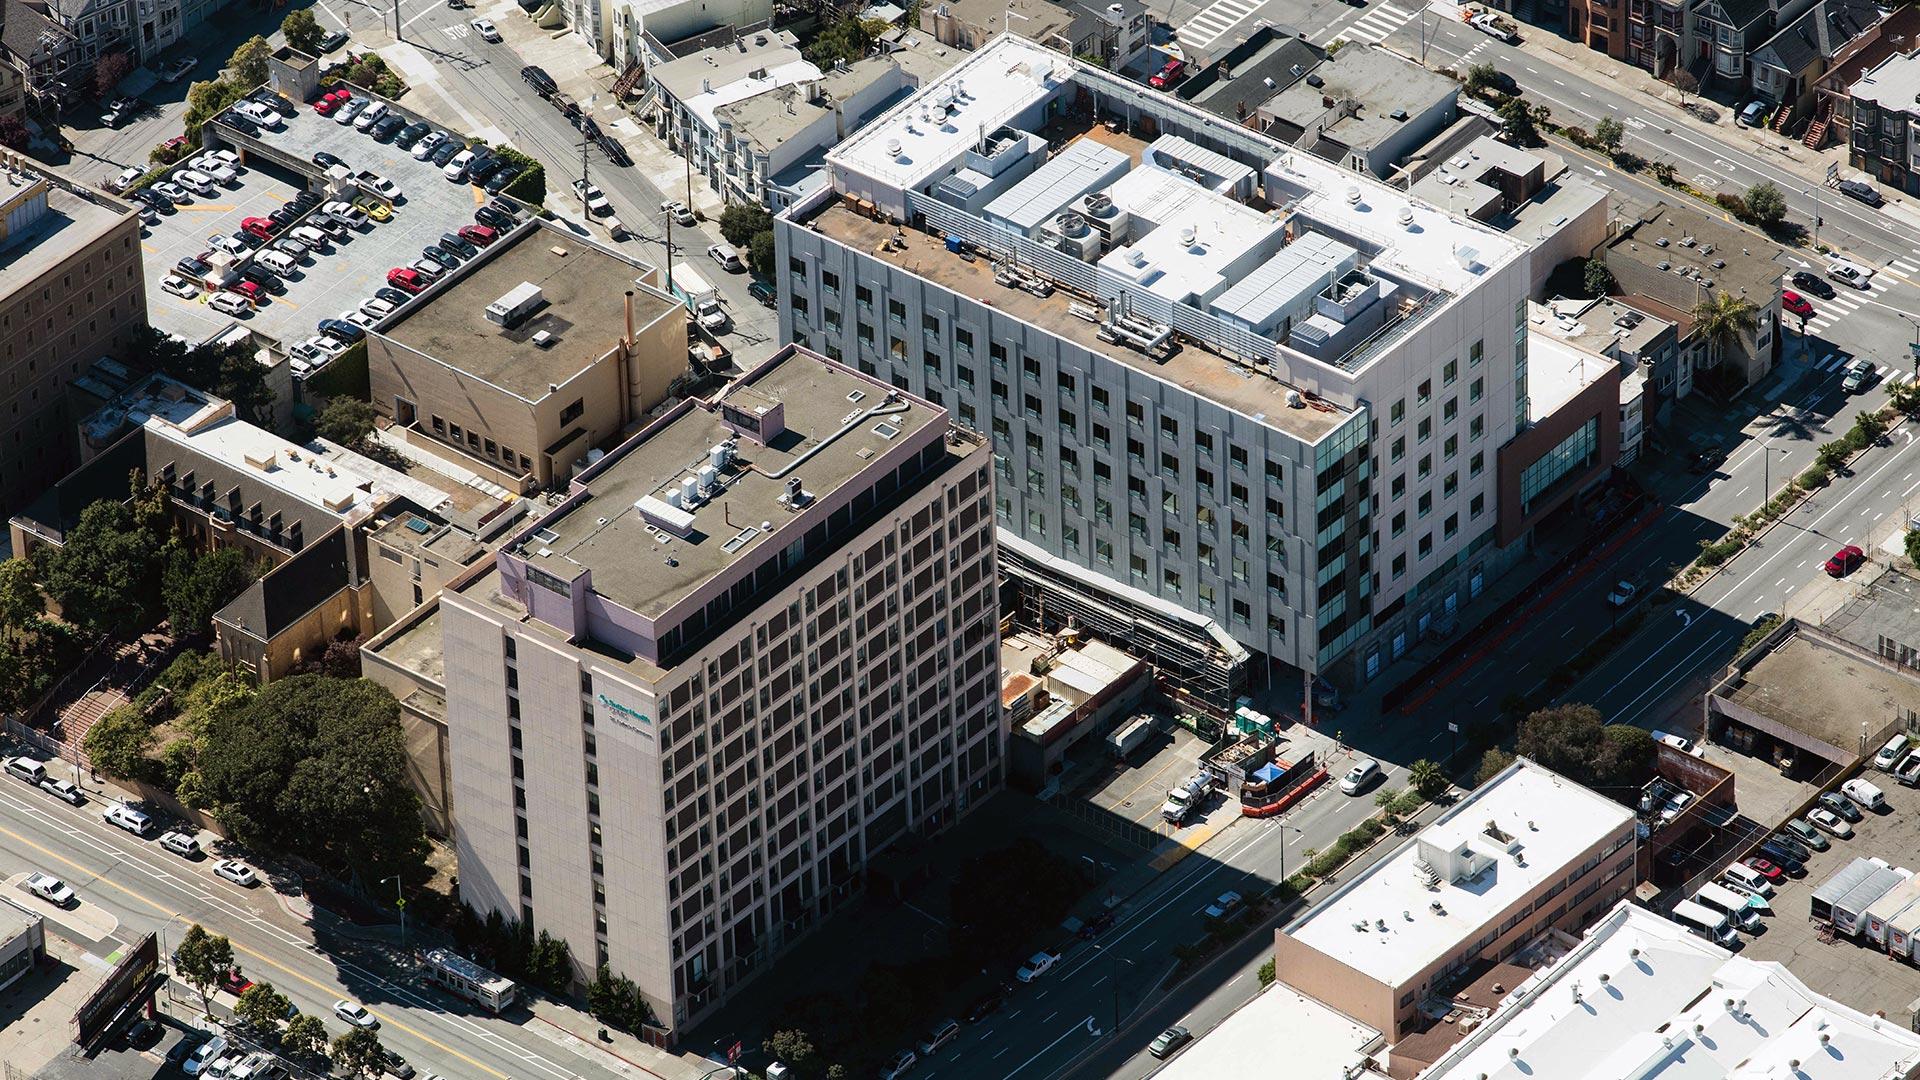 St. Luke's Hospital - San Francisco - long view